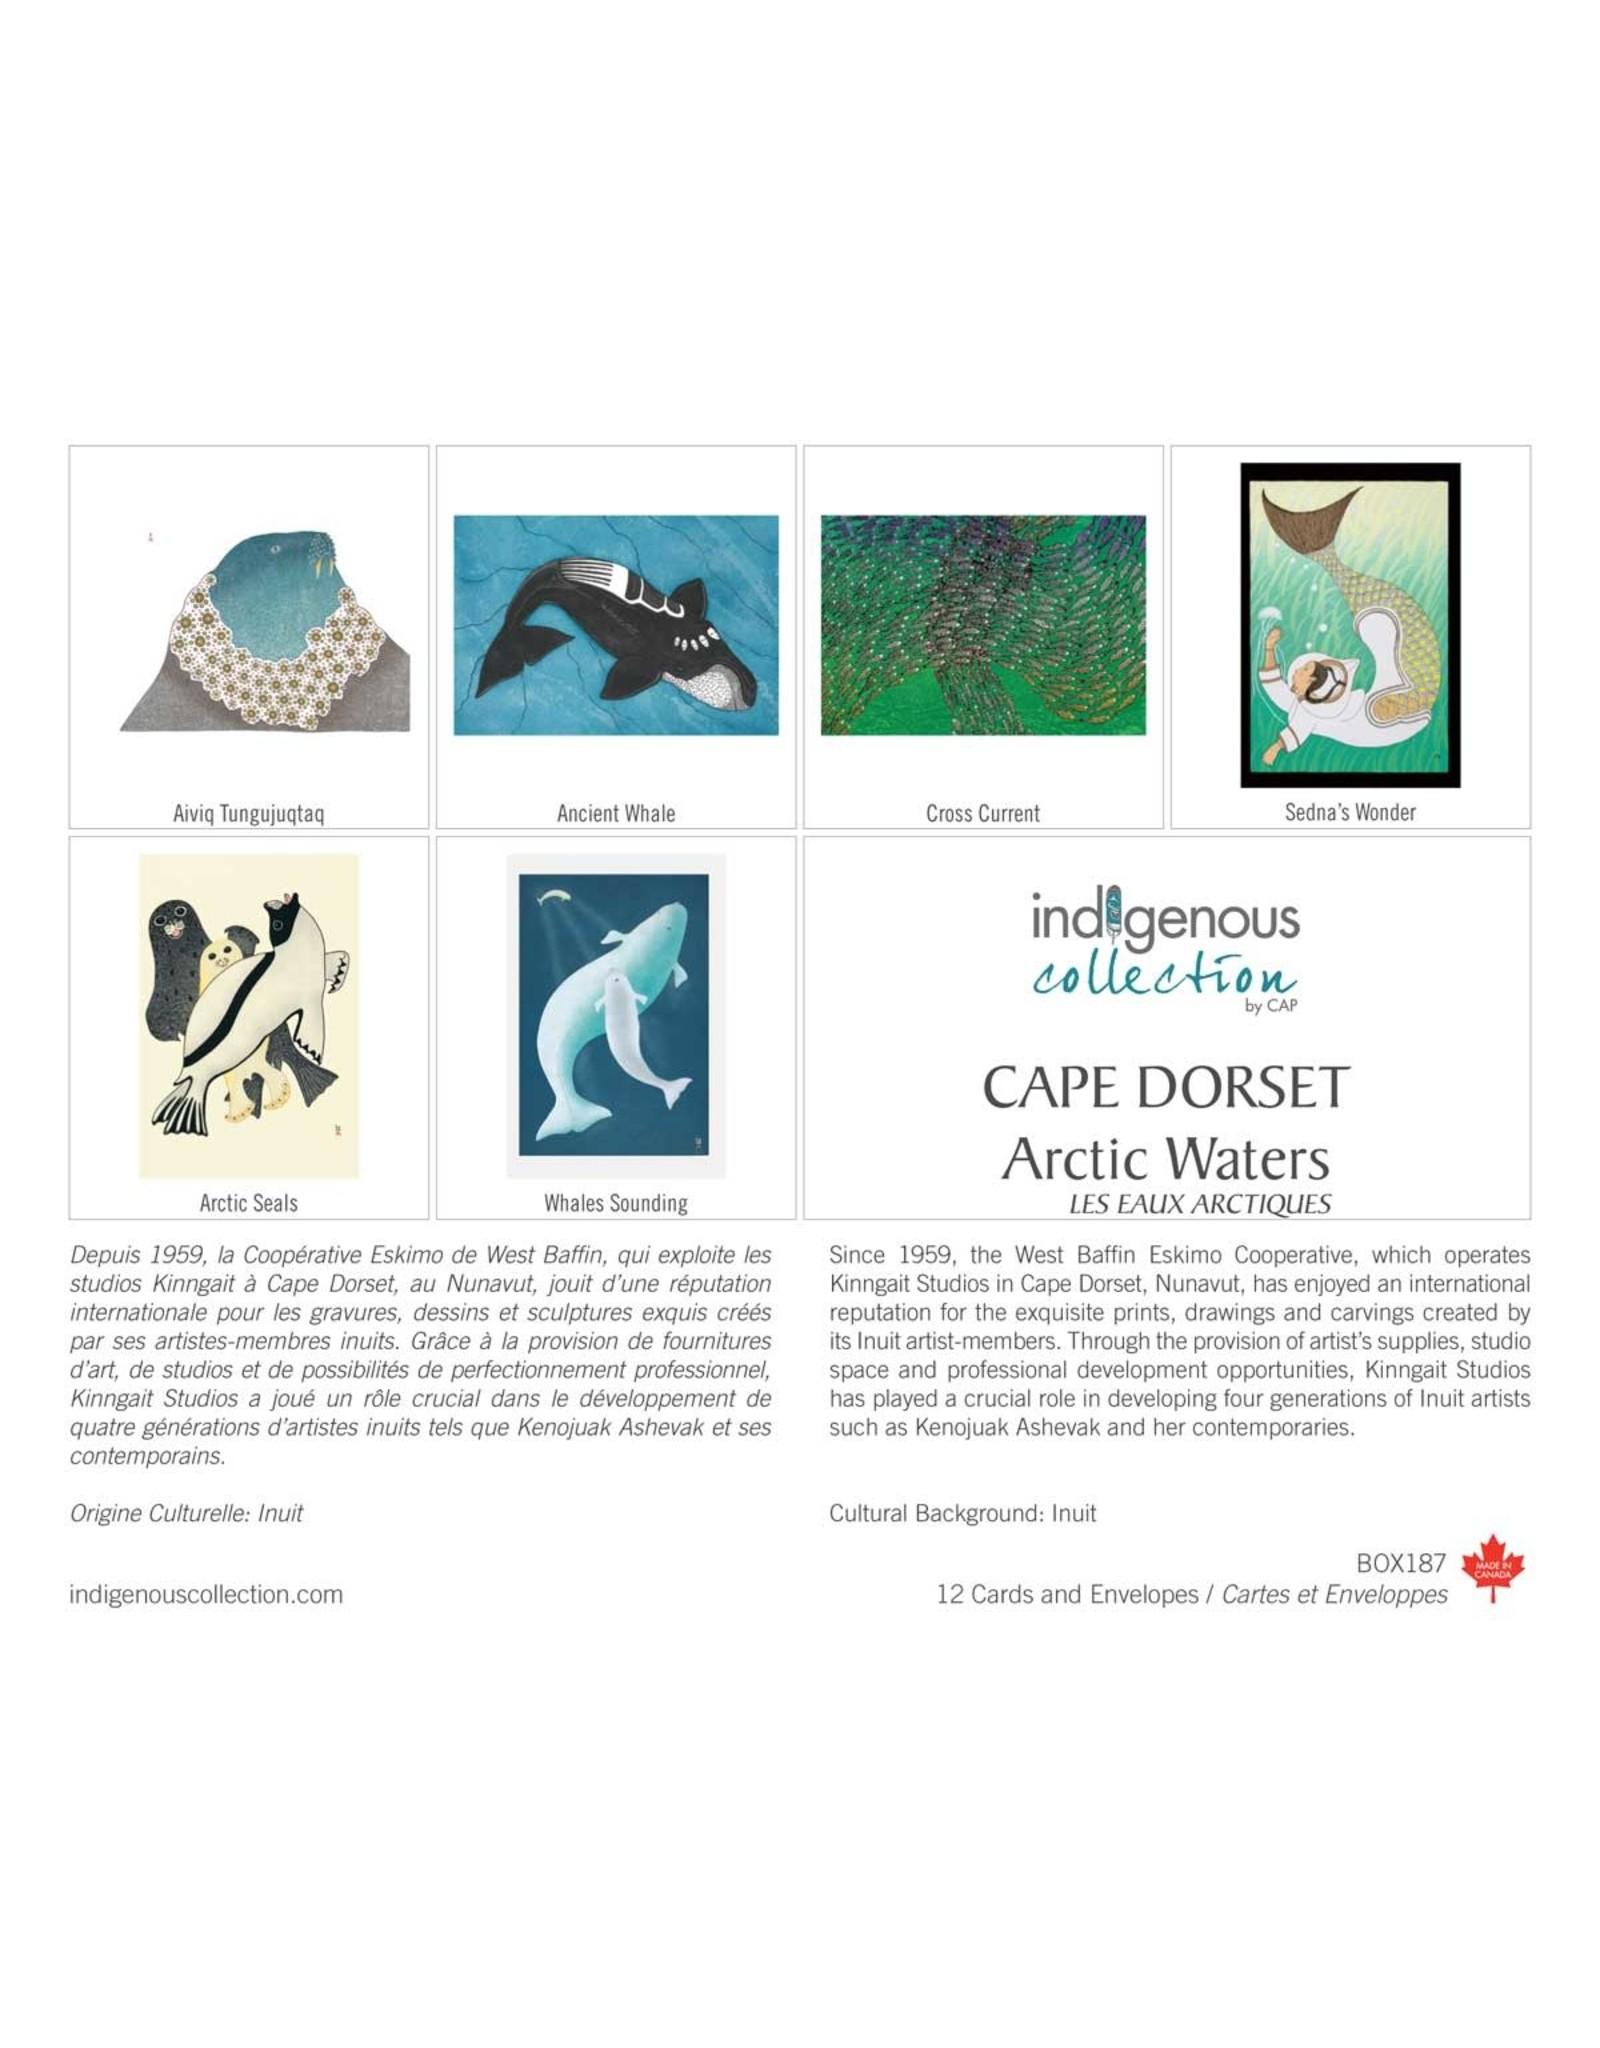 Arctic Waters 12 Card Box - Box 187